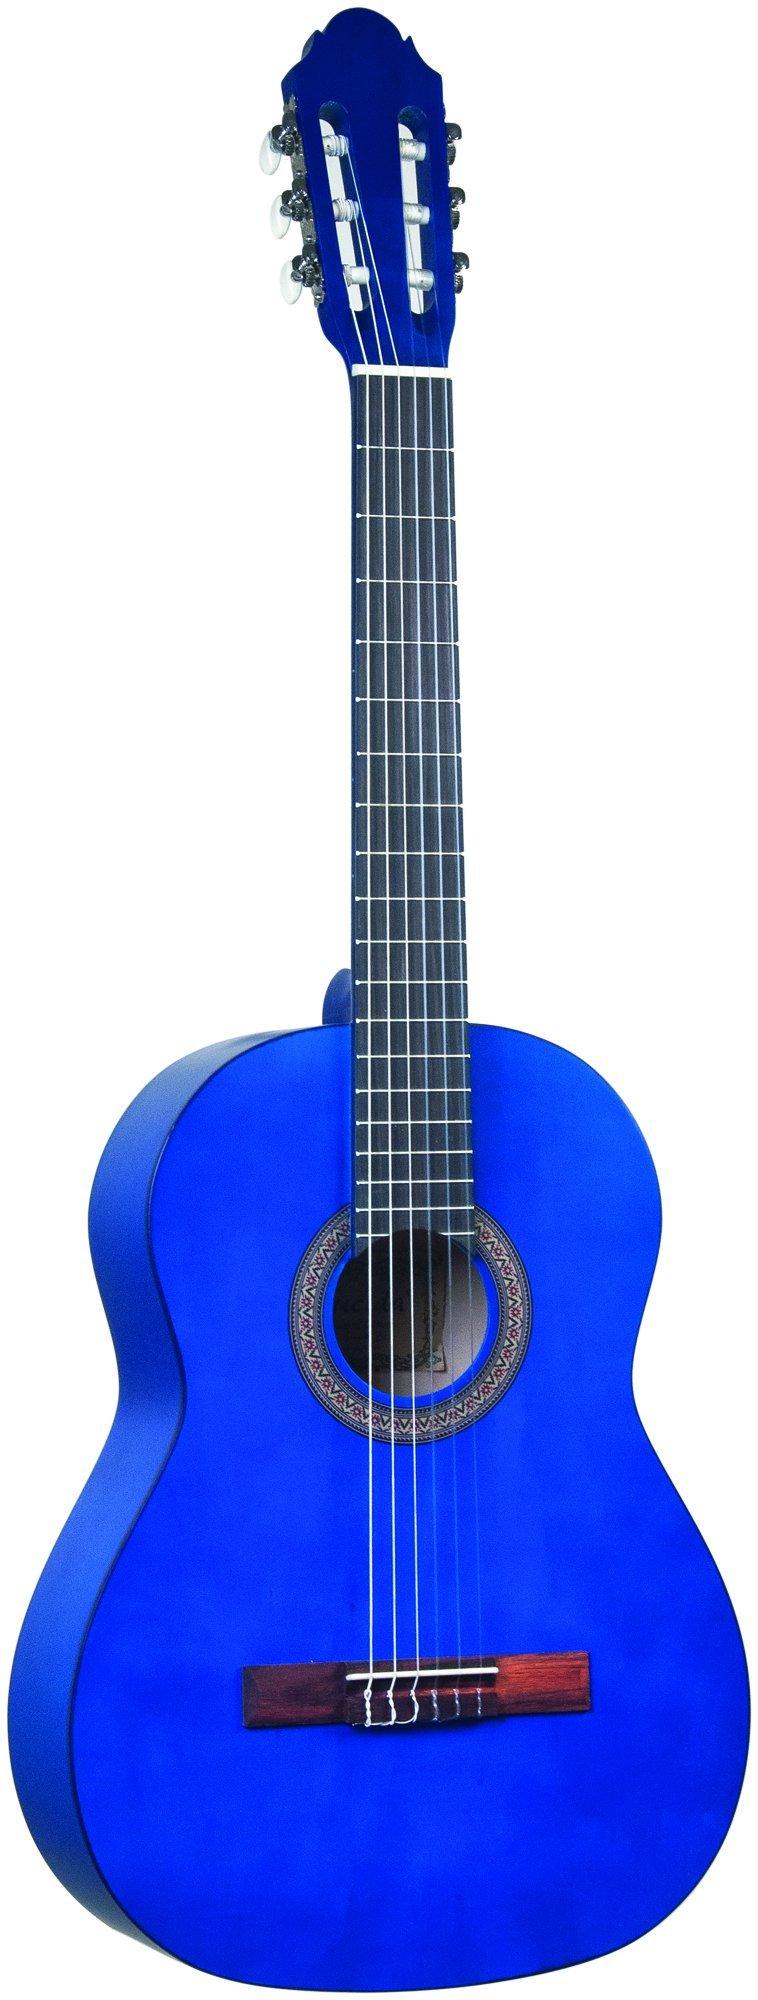 Lucida LG-400-3/4BL Student Classical Guitar, Blue, 3/4 Size